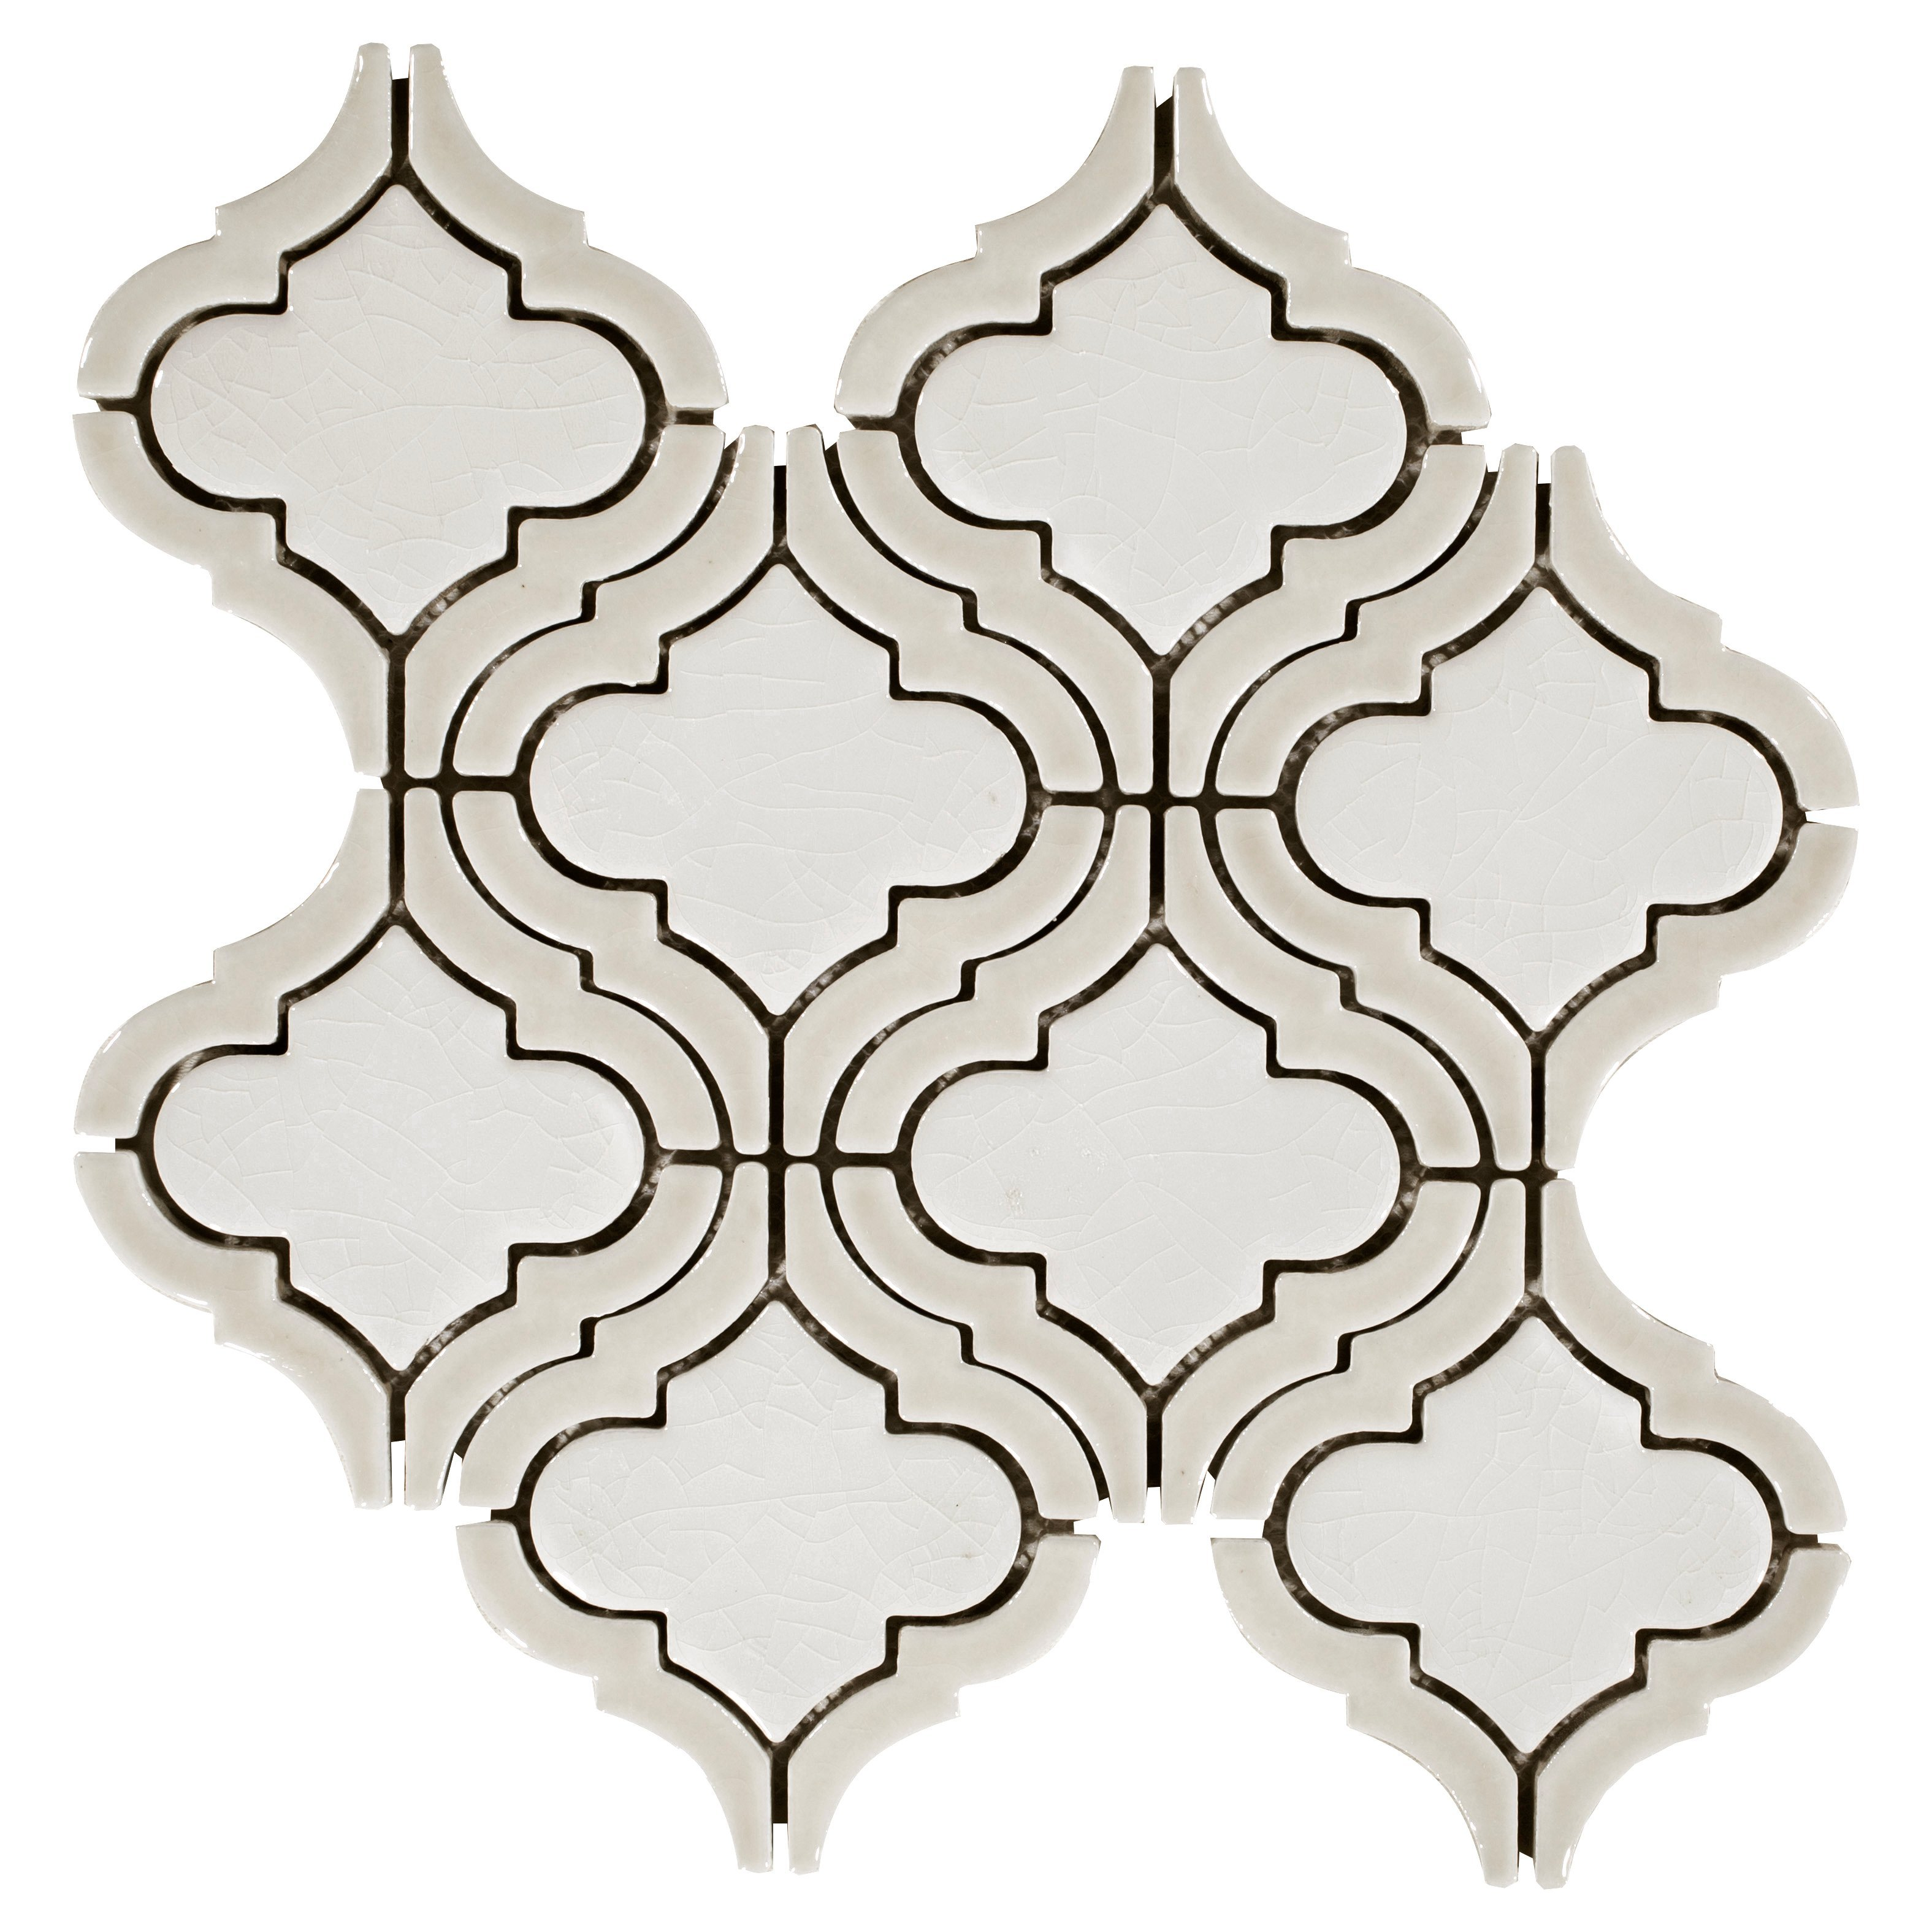 Gray Blend Tear Drop Porcelain Mosaic 12 X 12